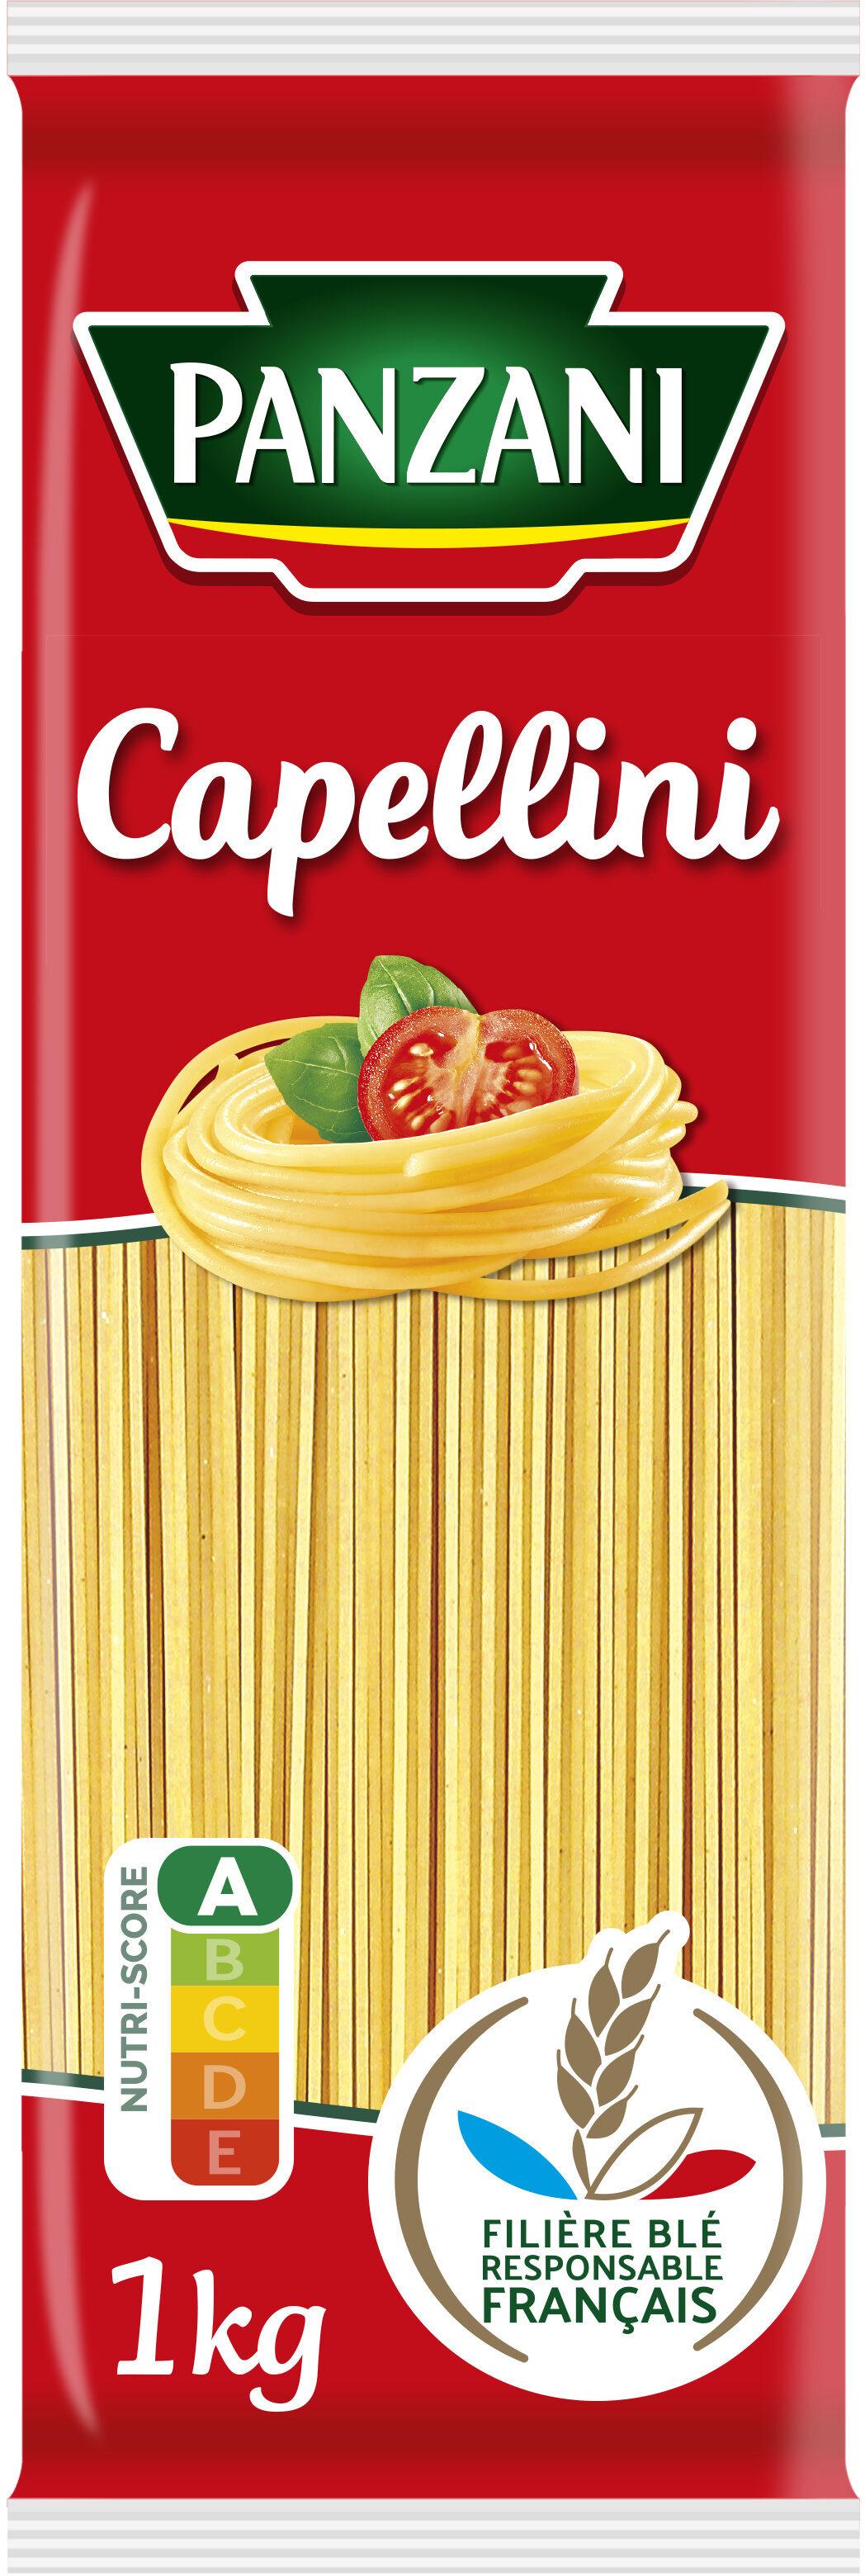 Panzani capellini 1kg - Product - fr